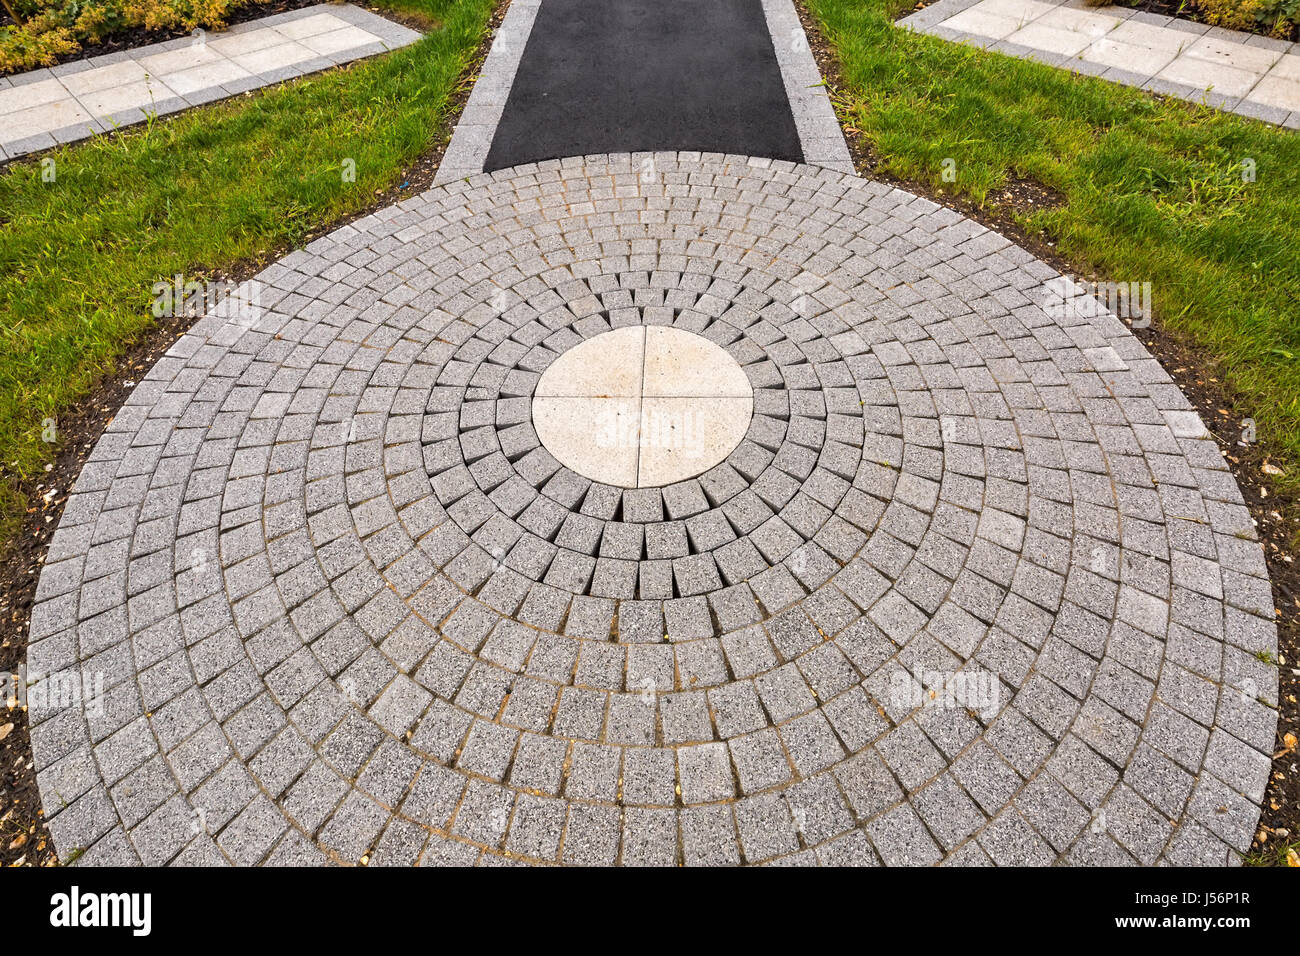 kreis pflaster betonboden außendekoration stockfoto, bild: 140905235